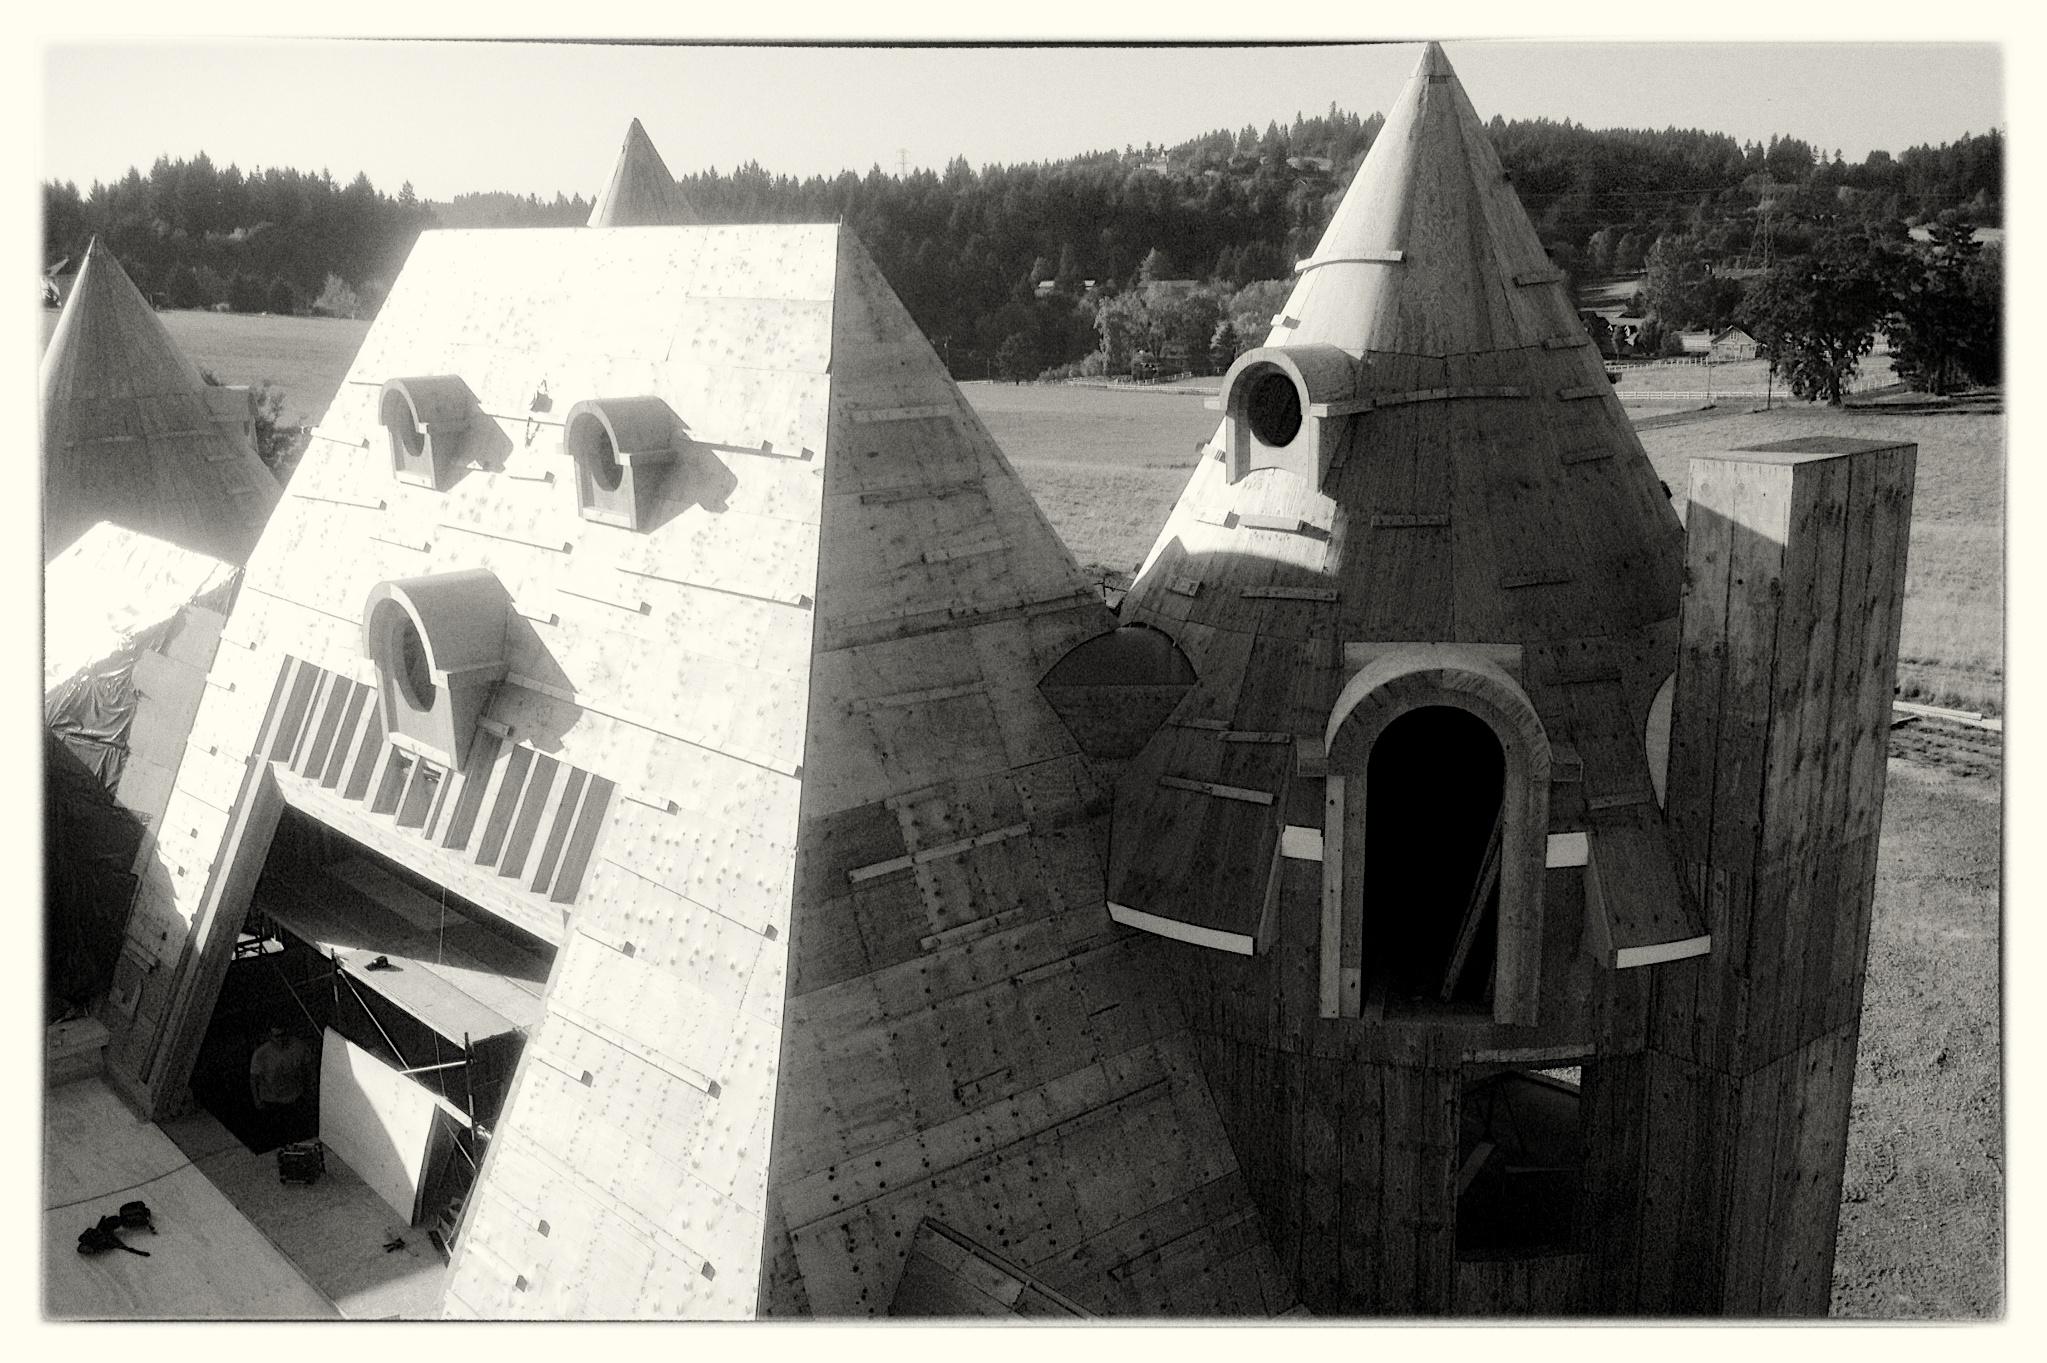 Complex Hand Cut Roof System - West Linn